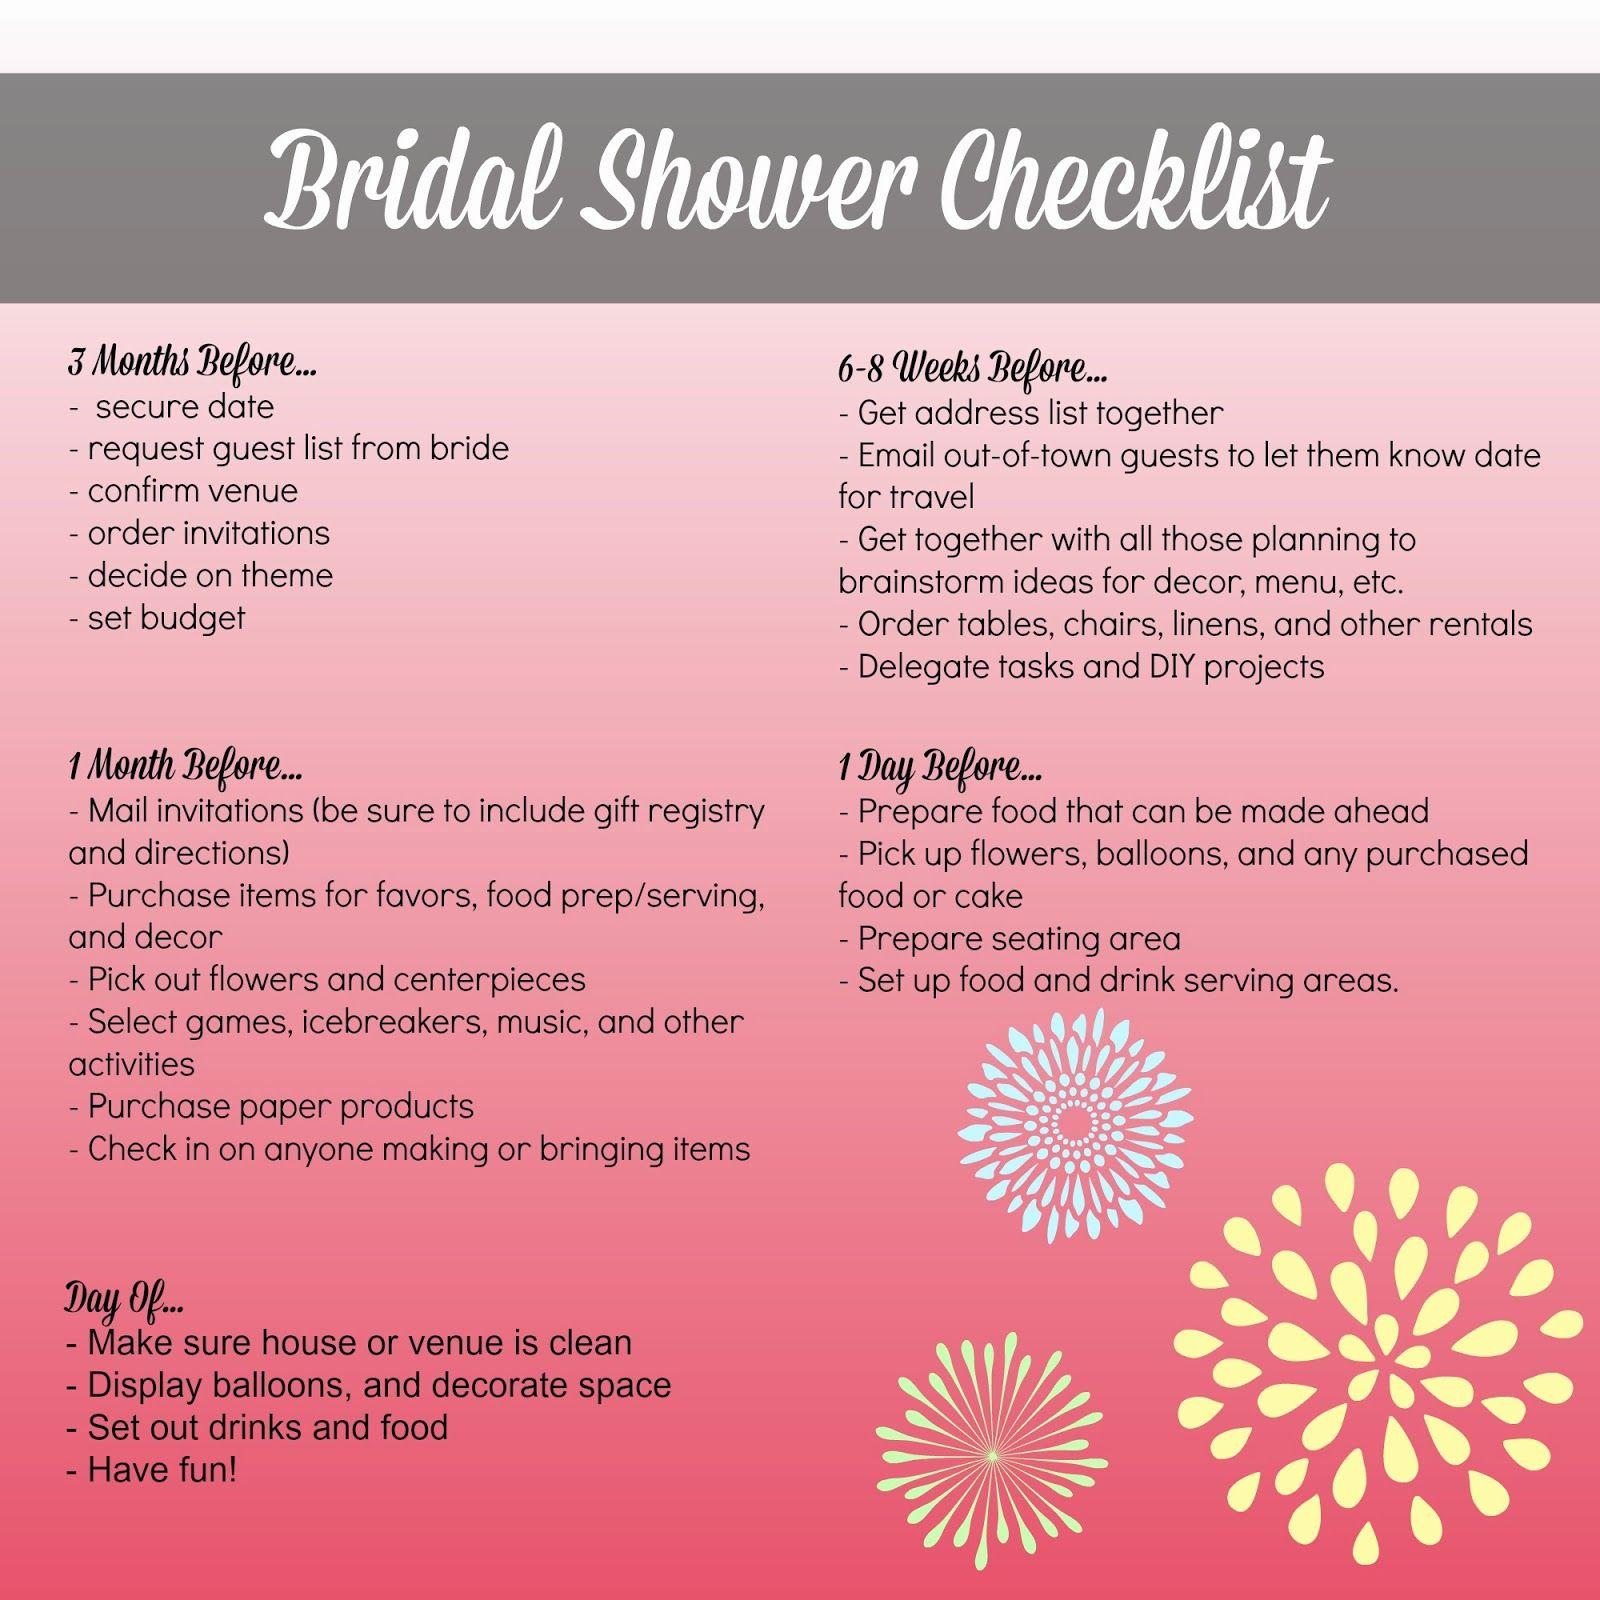 Bridal Shower Planning Checklist Bridal Shower